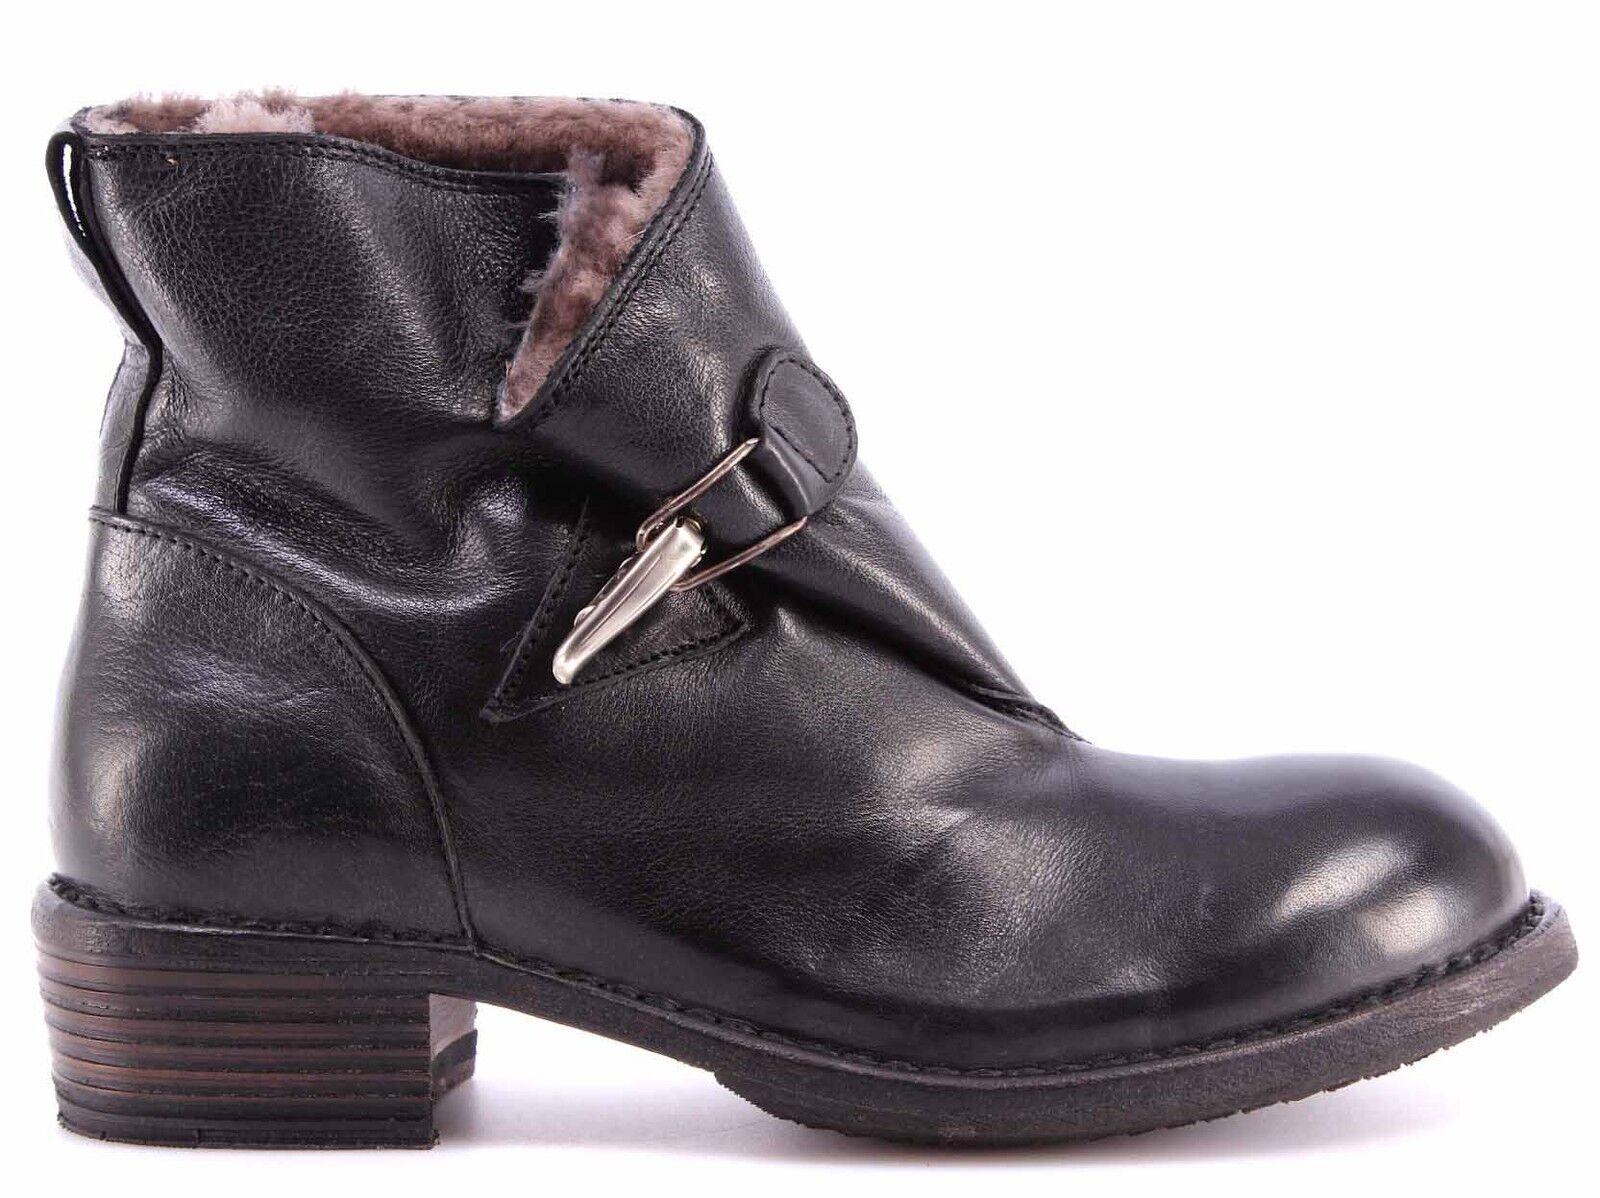 Para mujeres Zapatos Zapatos Zapatos Botines MOMA 78501-4A Cusna negro Negro Piel Vintage Made   mejor opcion